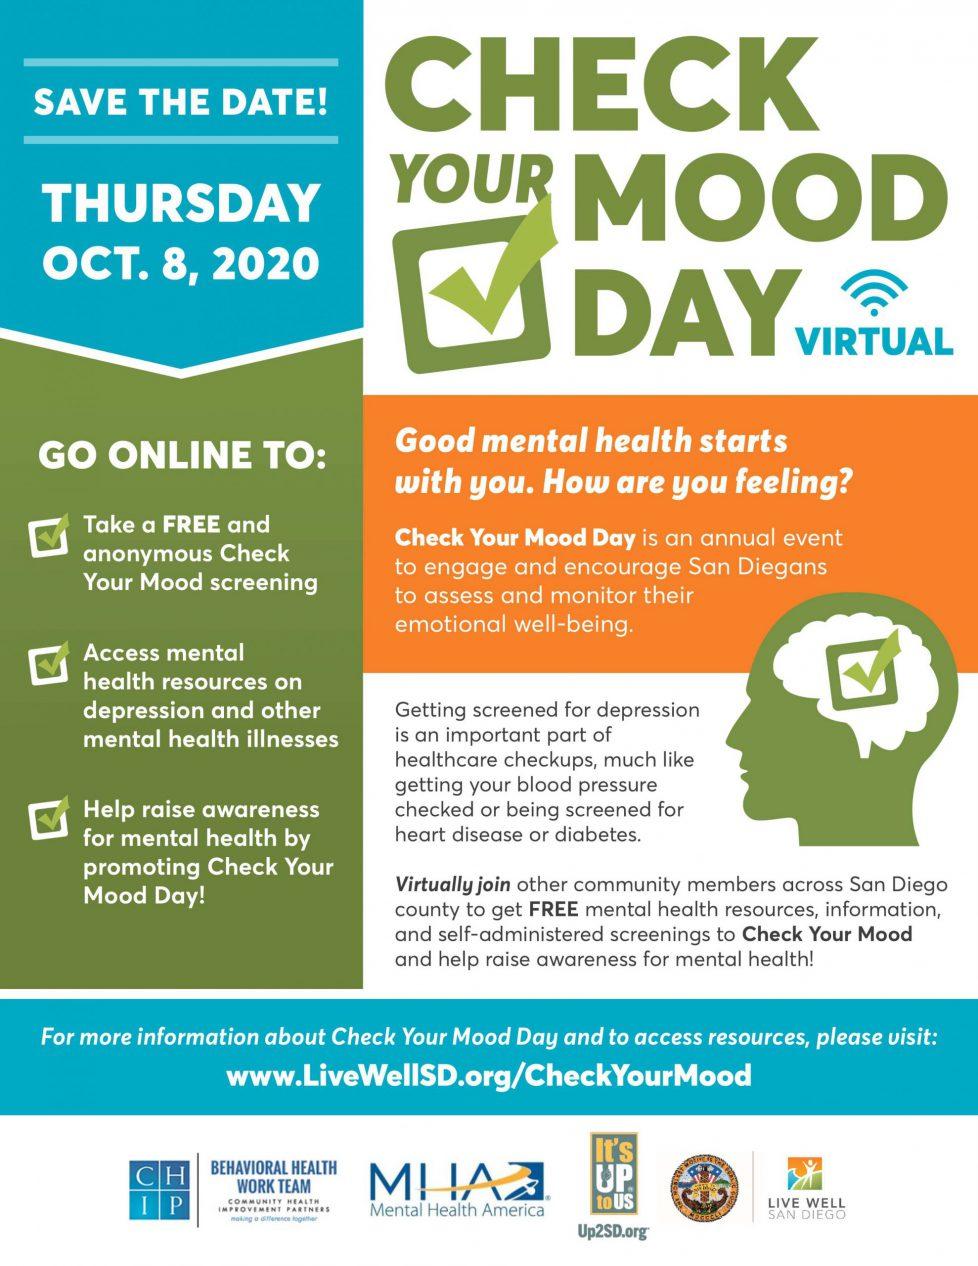 Virtual Check Your Mood Day